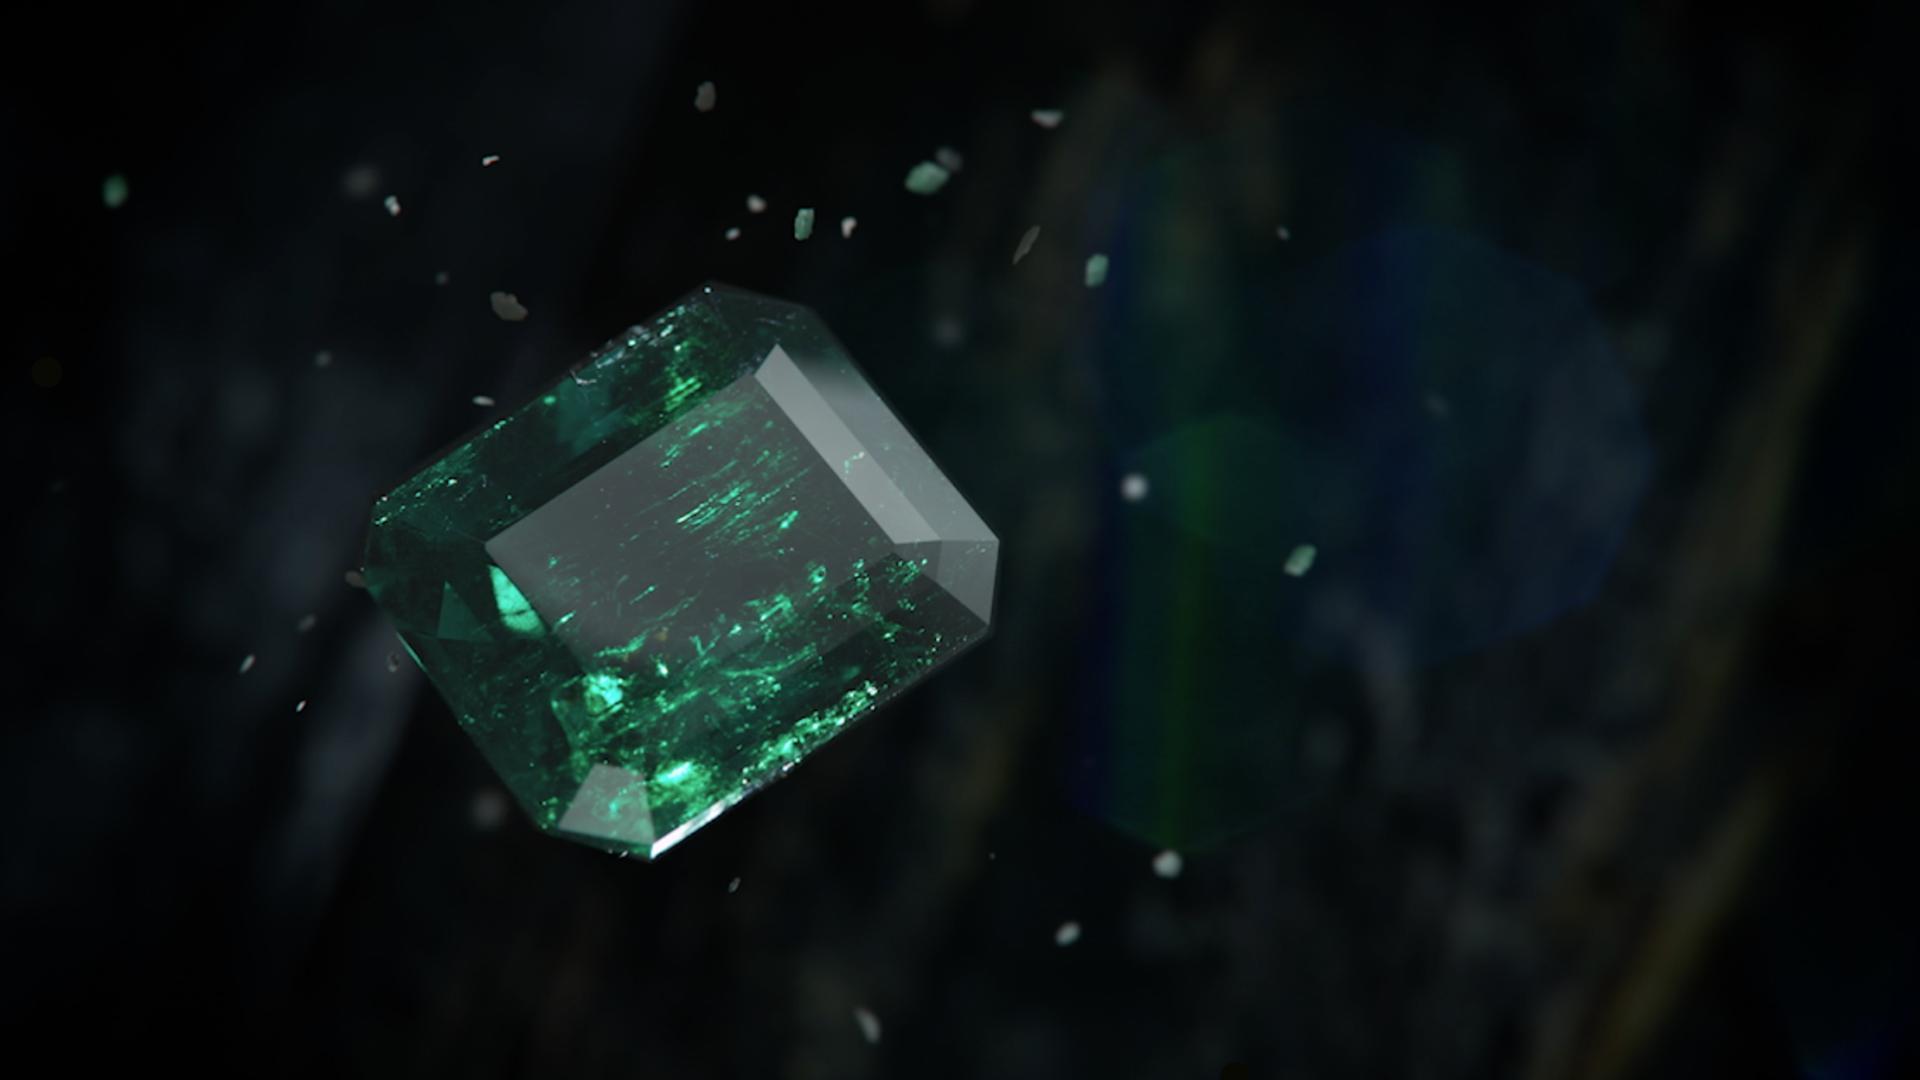 Mcogroup - vivid green Emerald shape columbia